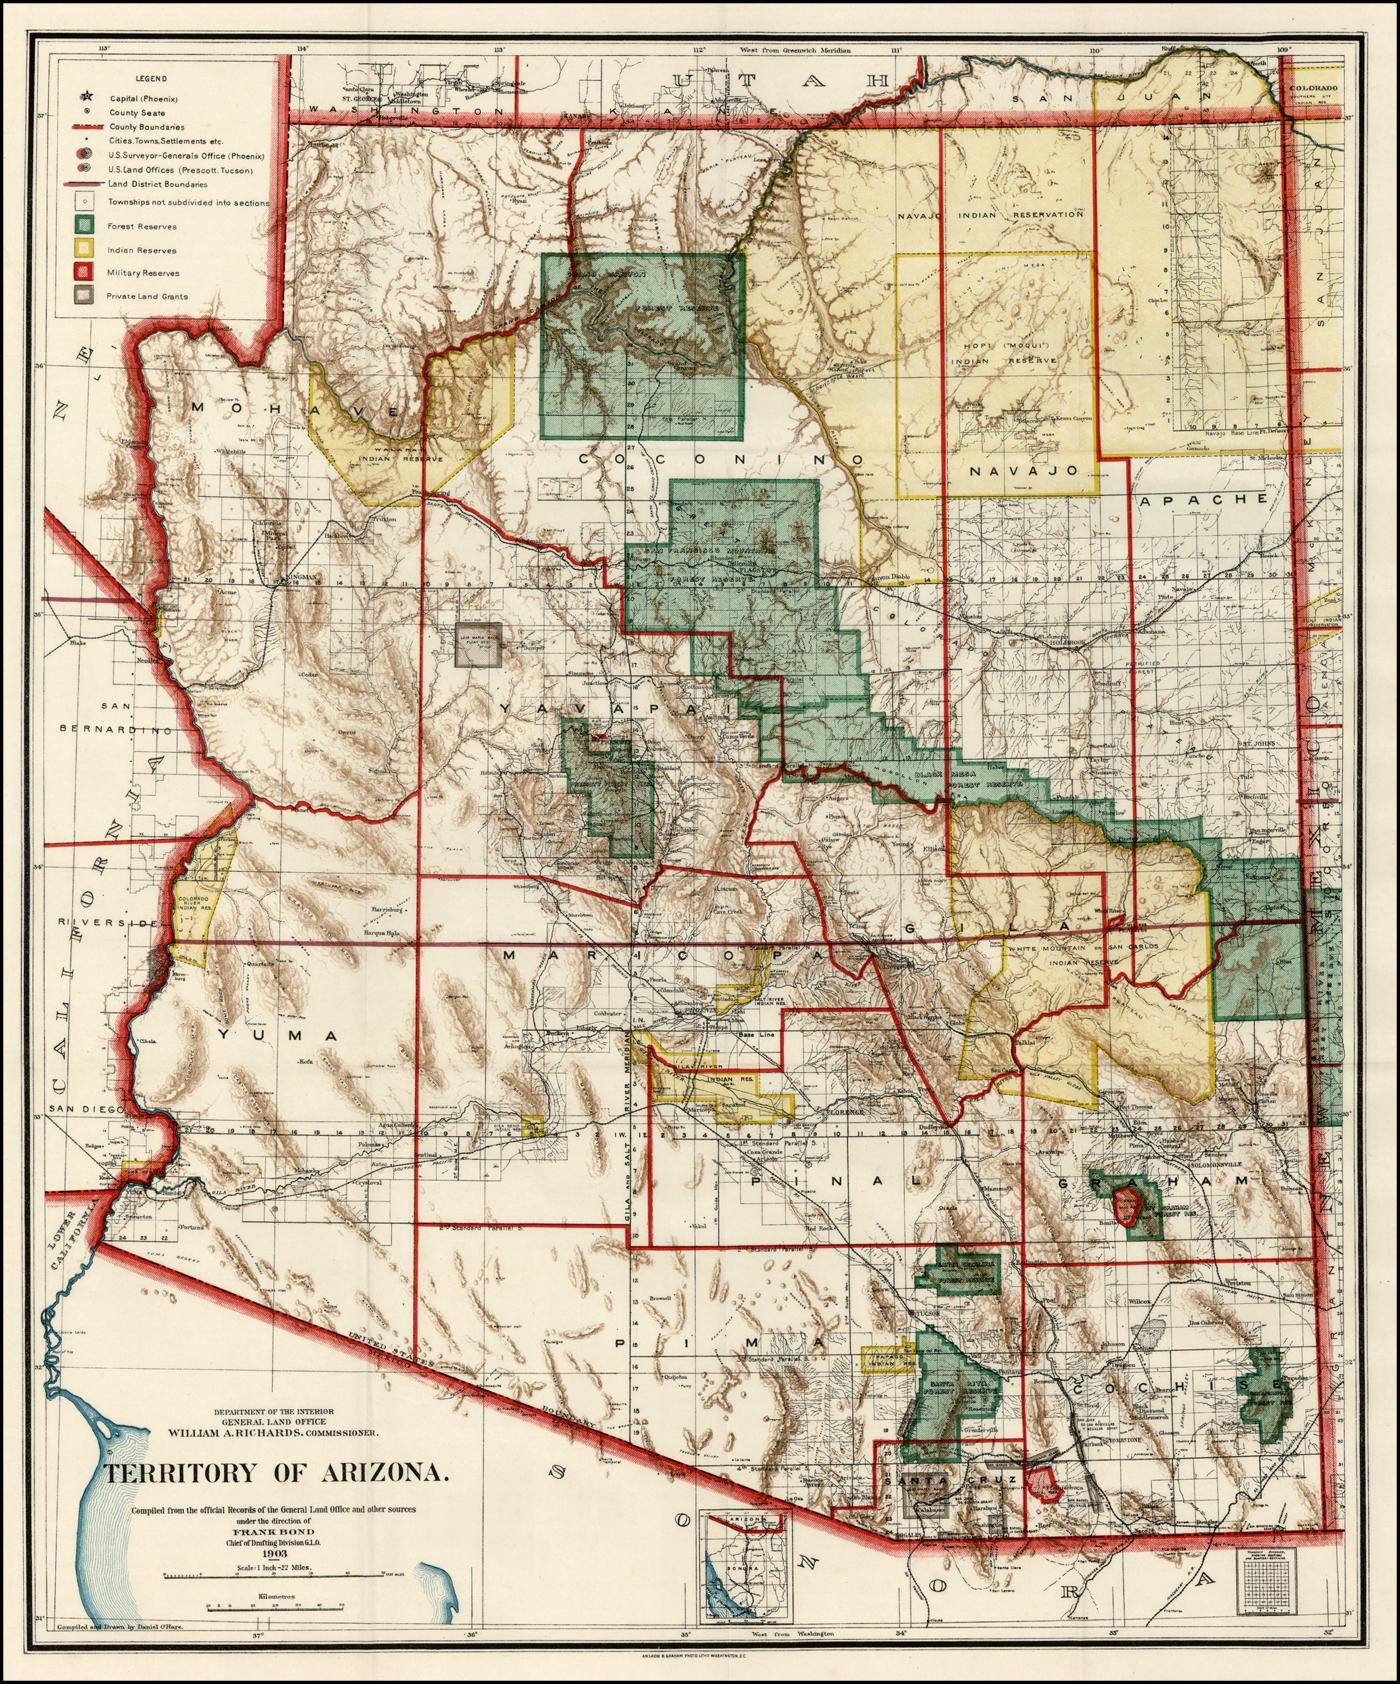 Territory of Arizona . . . 1903 - Barry Lawrence Ruderman ... on general map of georgia, general map of florida, general map of manhattan, general map of idaho, general map of paris,